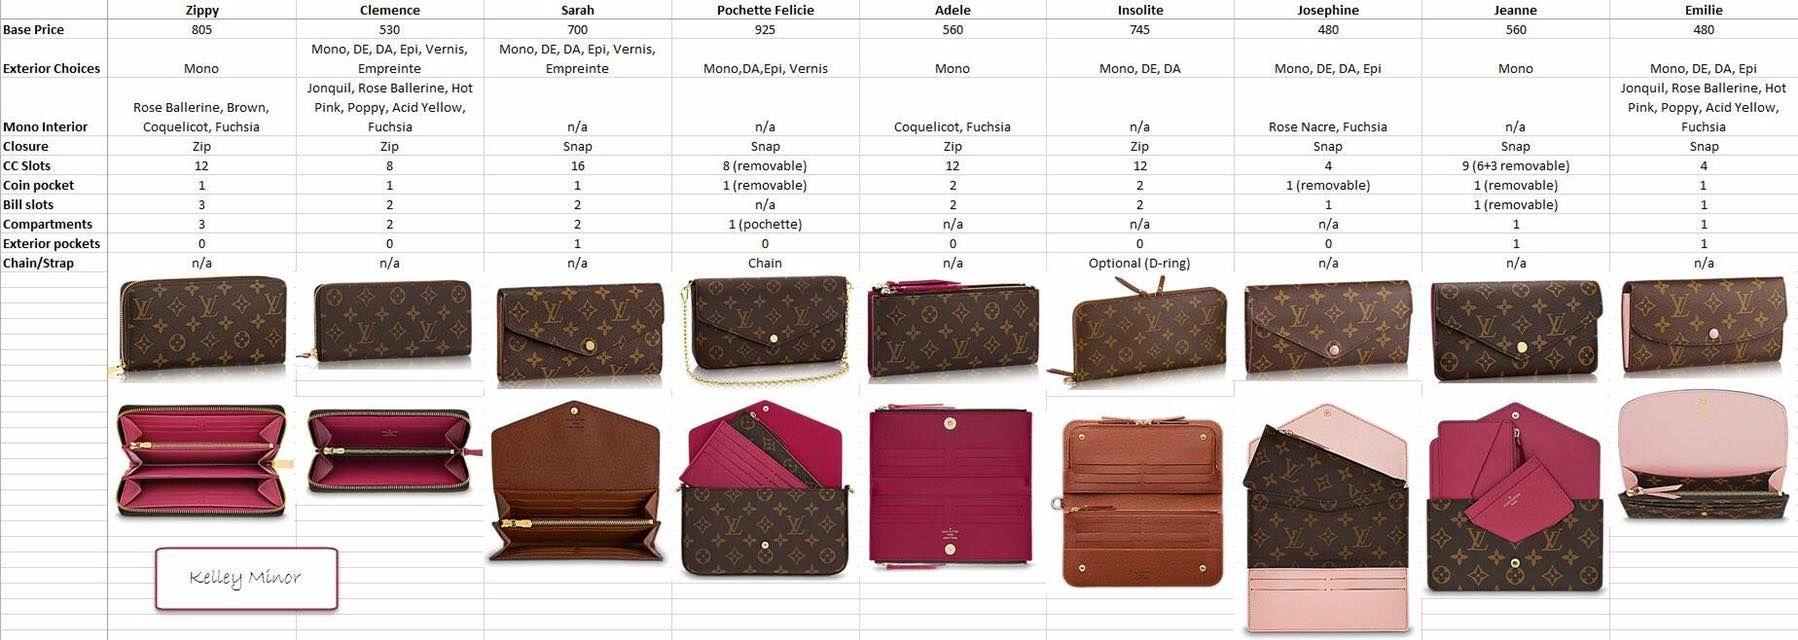 18b1660dd004 Louis Vuitton long wallets- Zippy